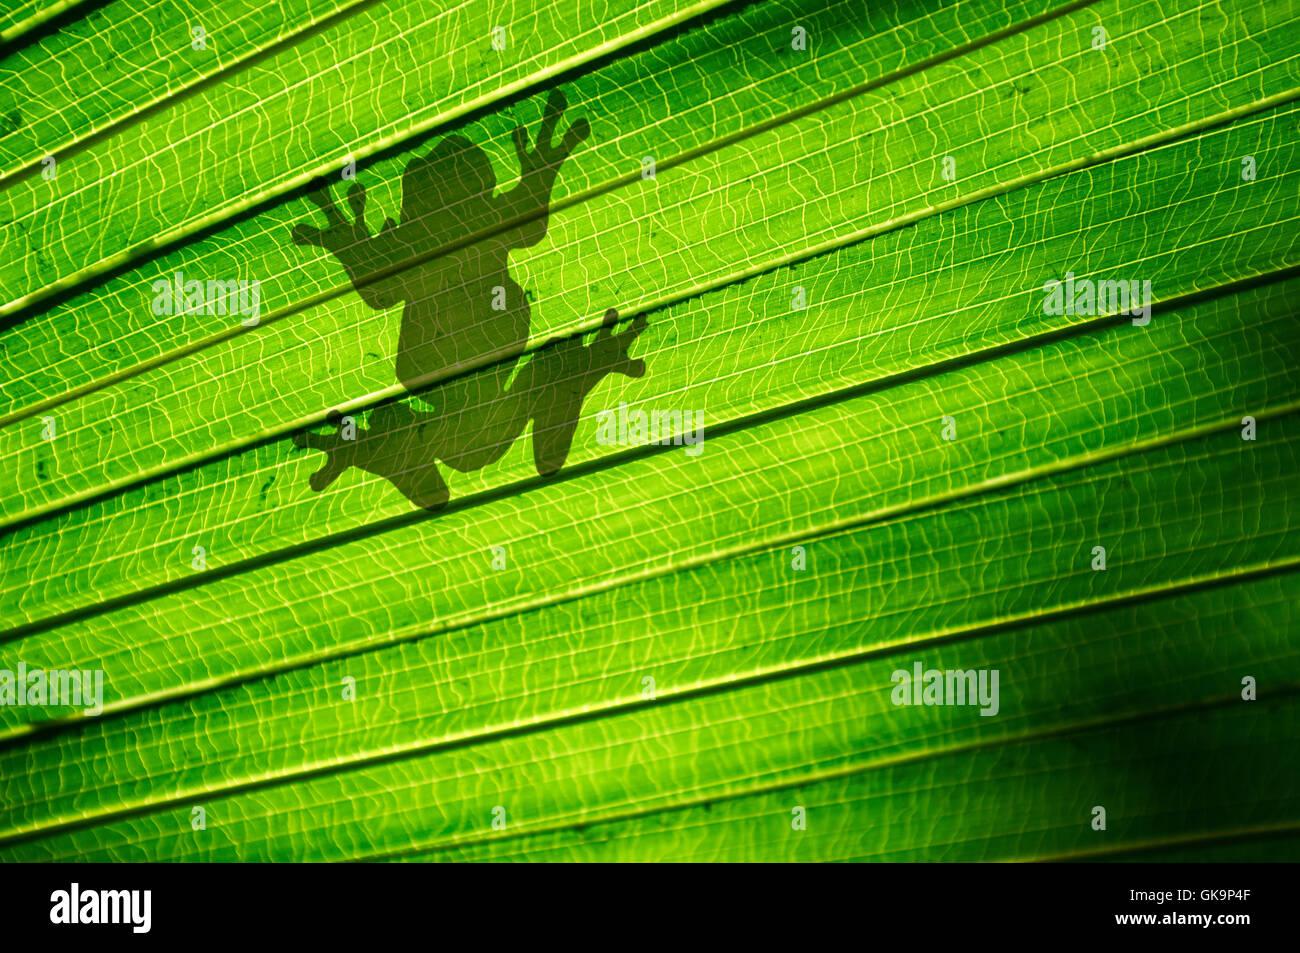 amphibian frog outline - Stock Image